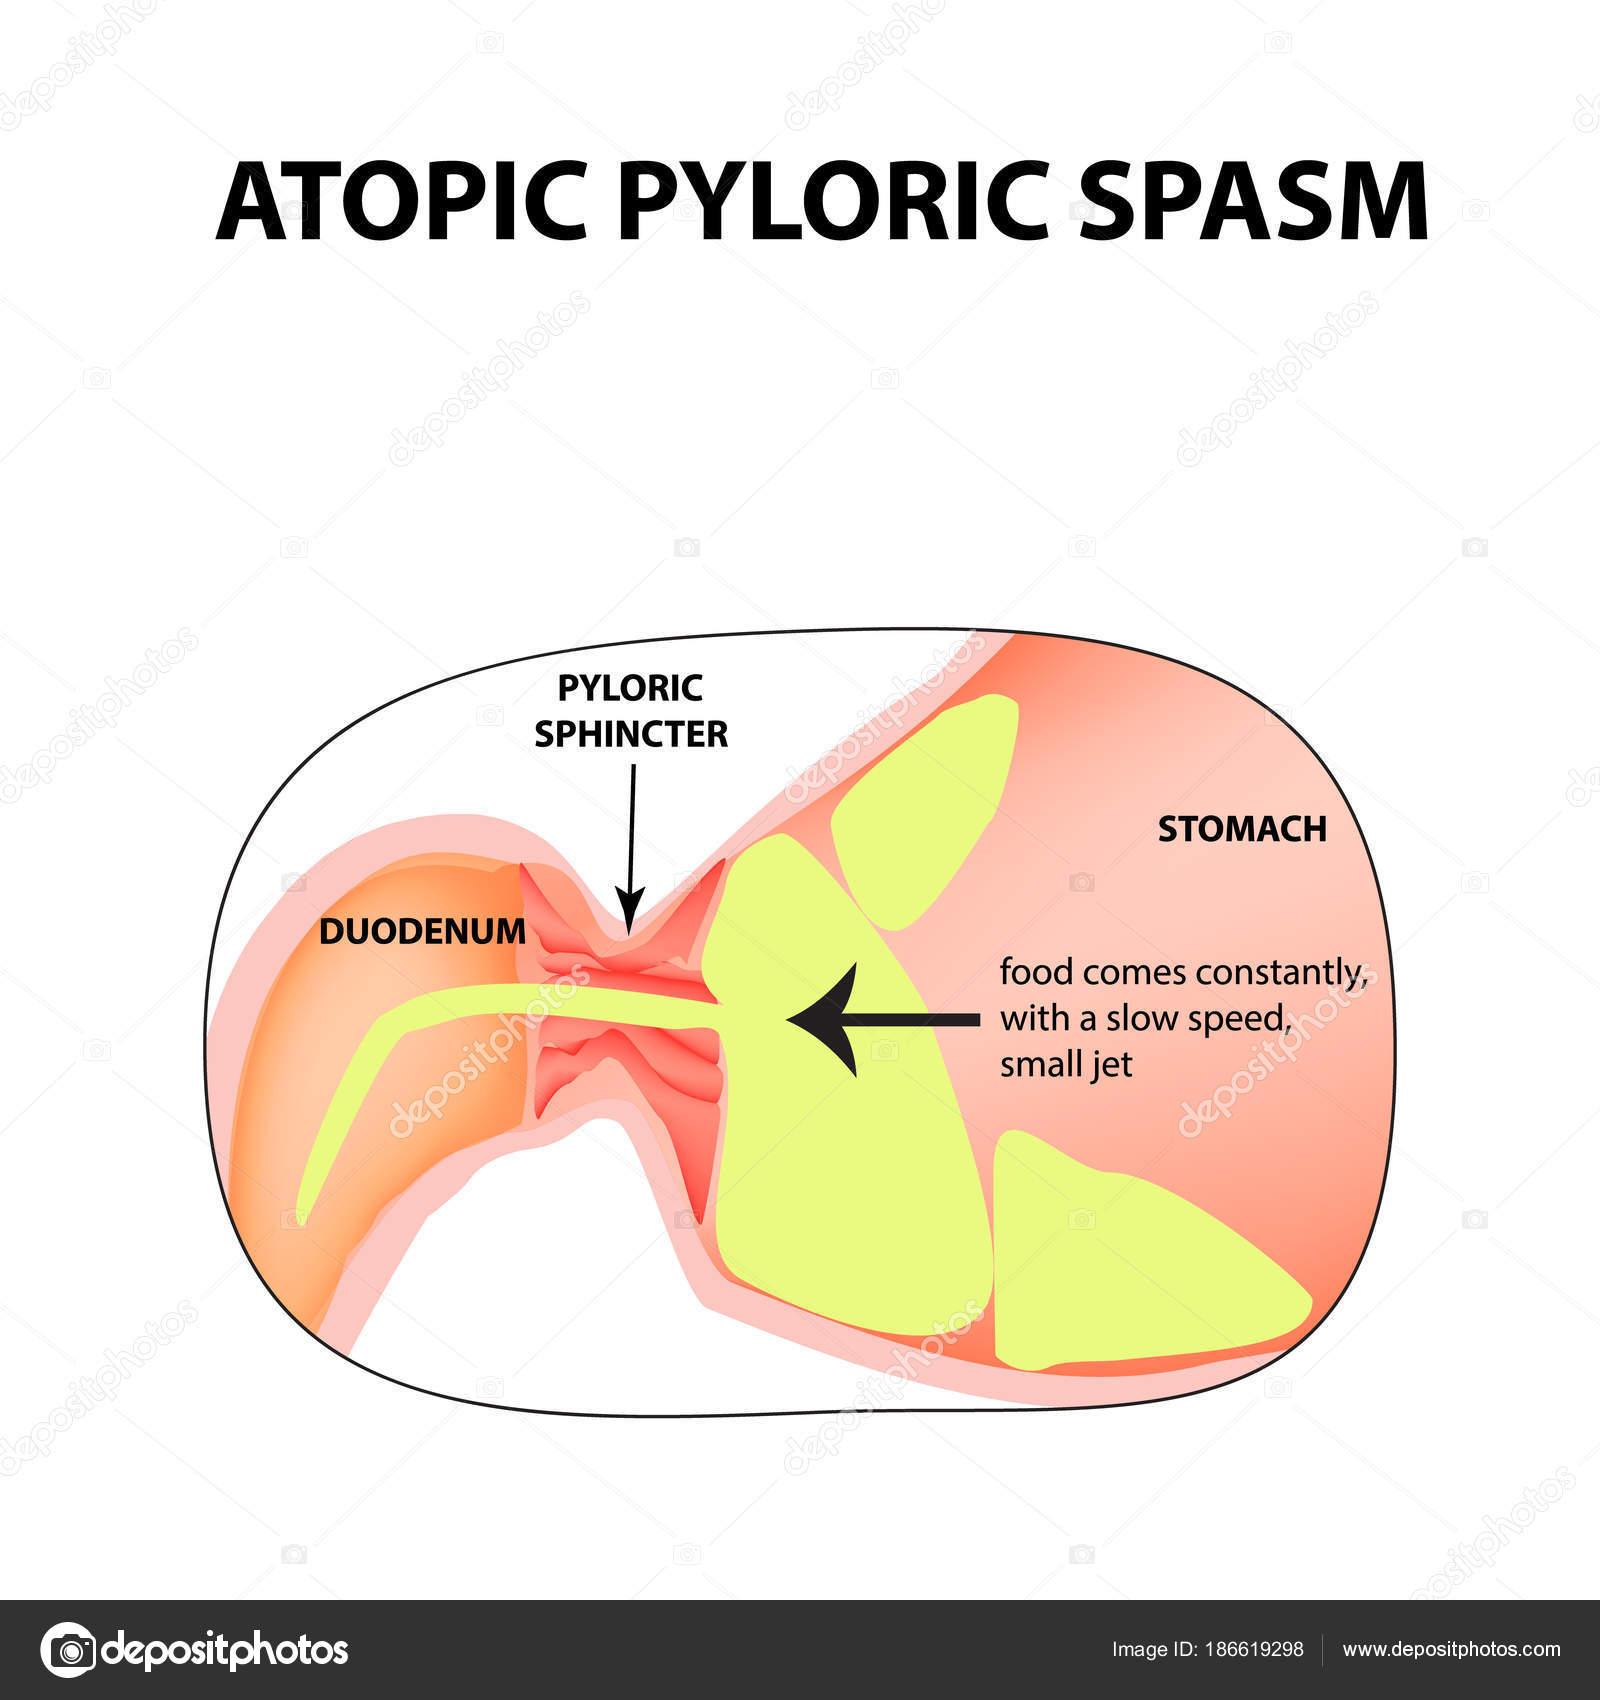 spasms of the pylorus. Pylorospasm. atonic. Pyloric sphincter of the ...